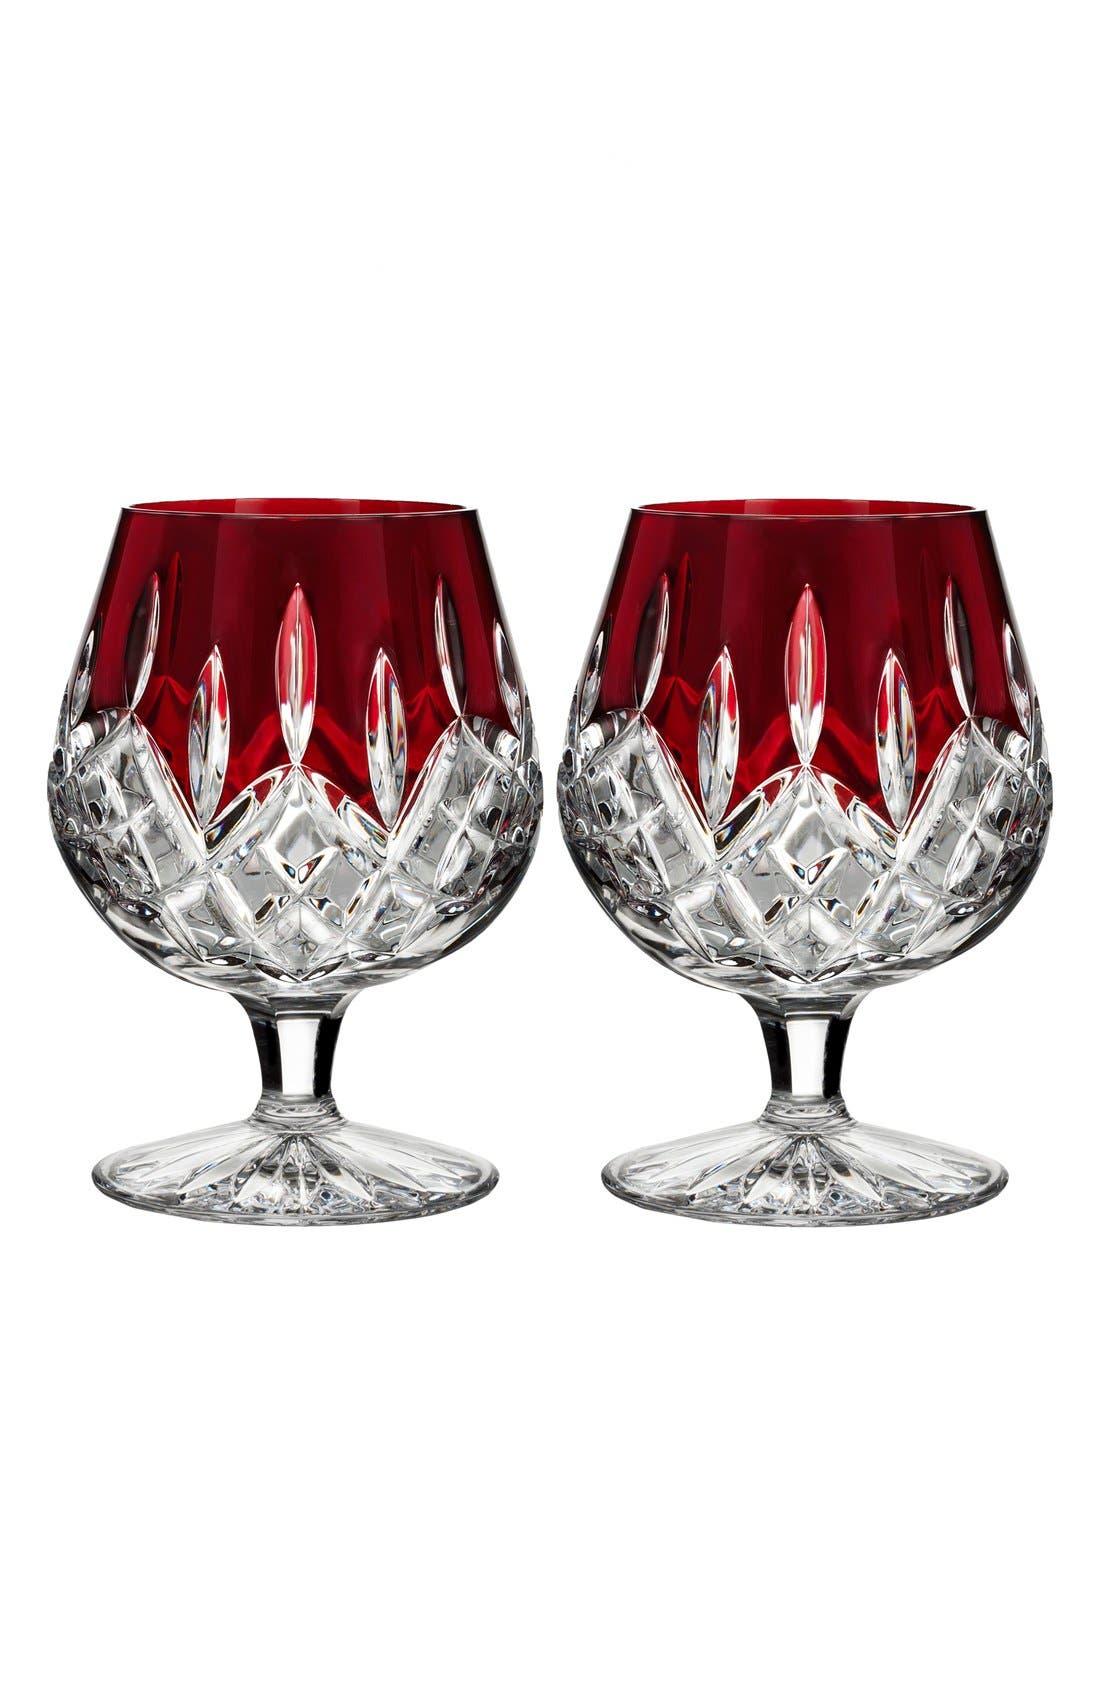 Waterford 'Lismore Red' Lead Crystal Brandy Glasses (Set of 2)